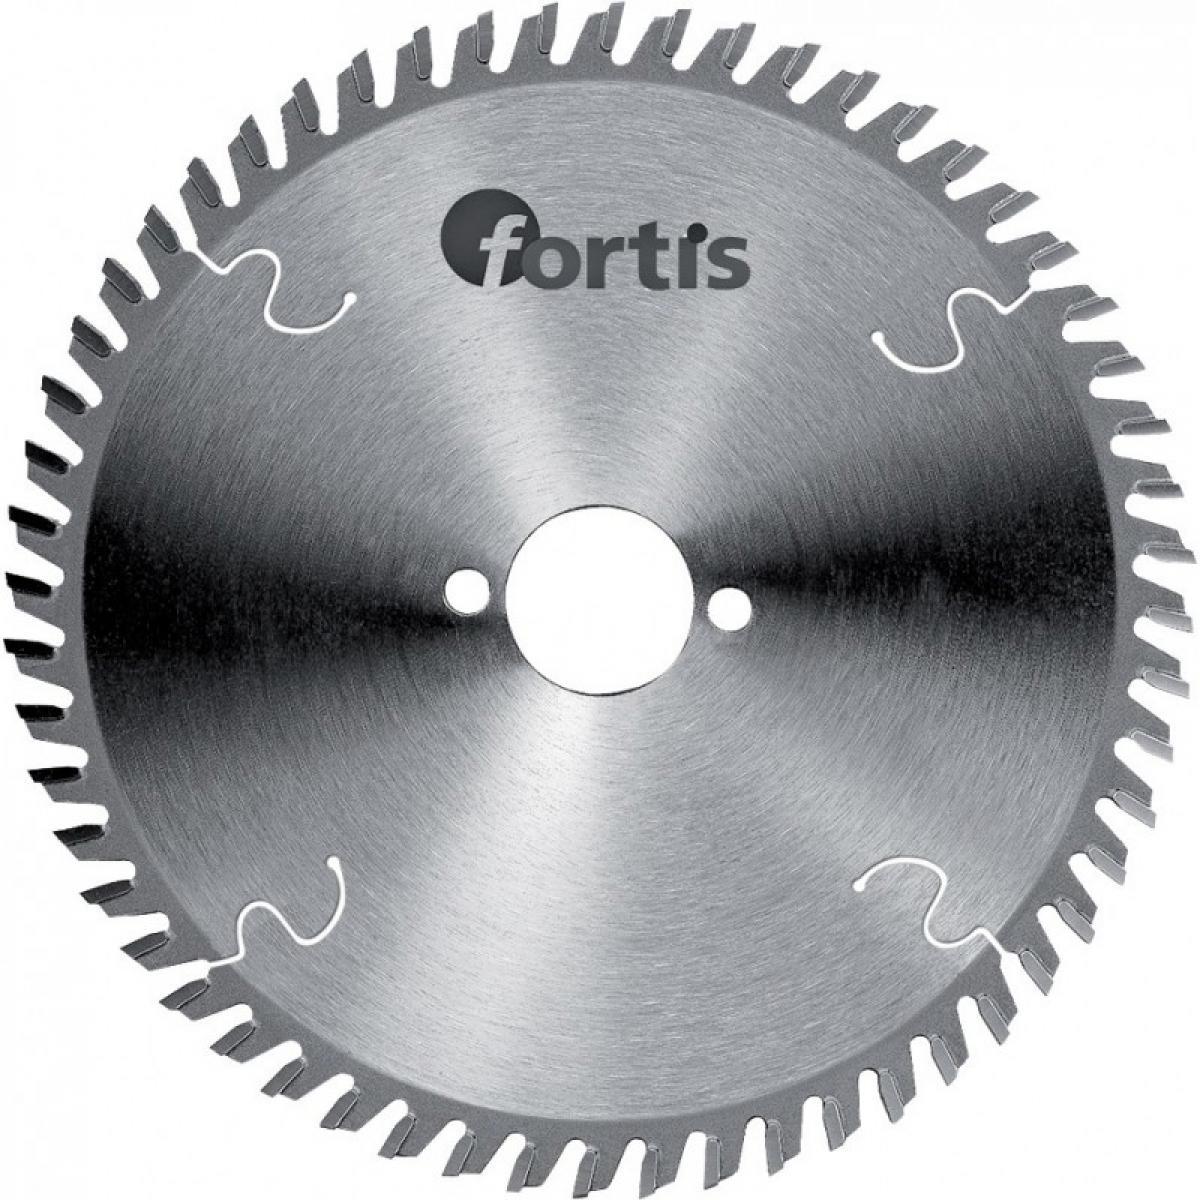 Fortis HW-Lame scie 160x2,8 x20mm Z36W Fortis